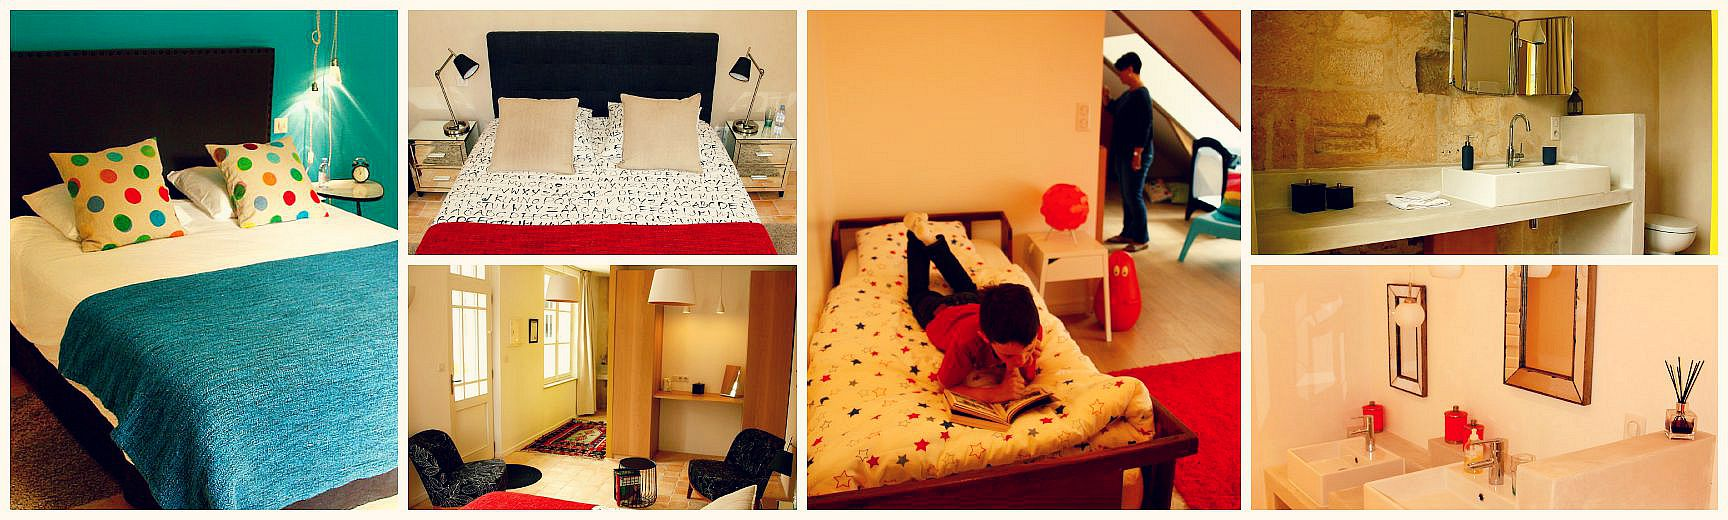 chambres h tes oise clos tilleuls le clos des tilleuls. Black Bedroom Furniture Sets. Home Design Ideas